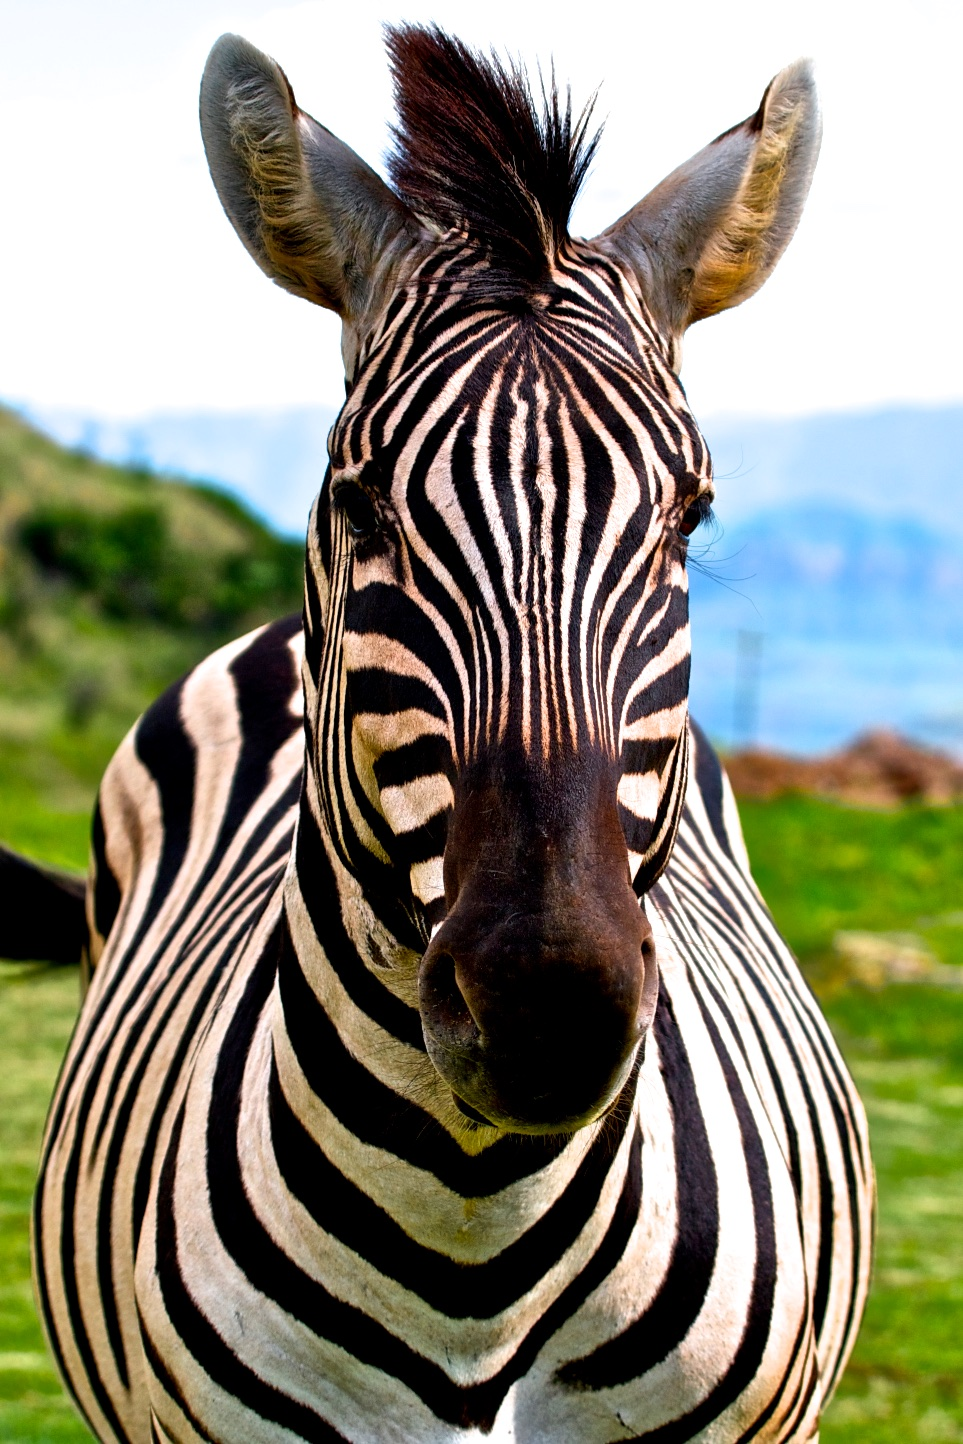 A zebra's stripes are like a human's fingerprints.